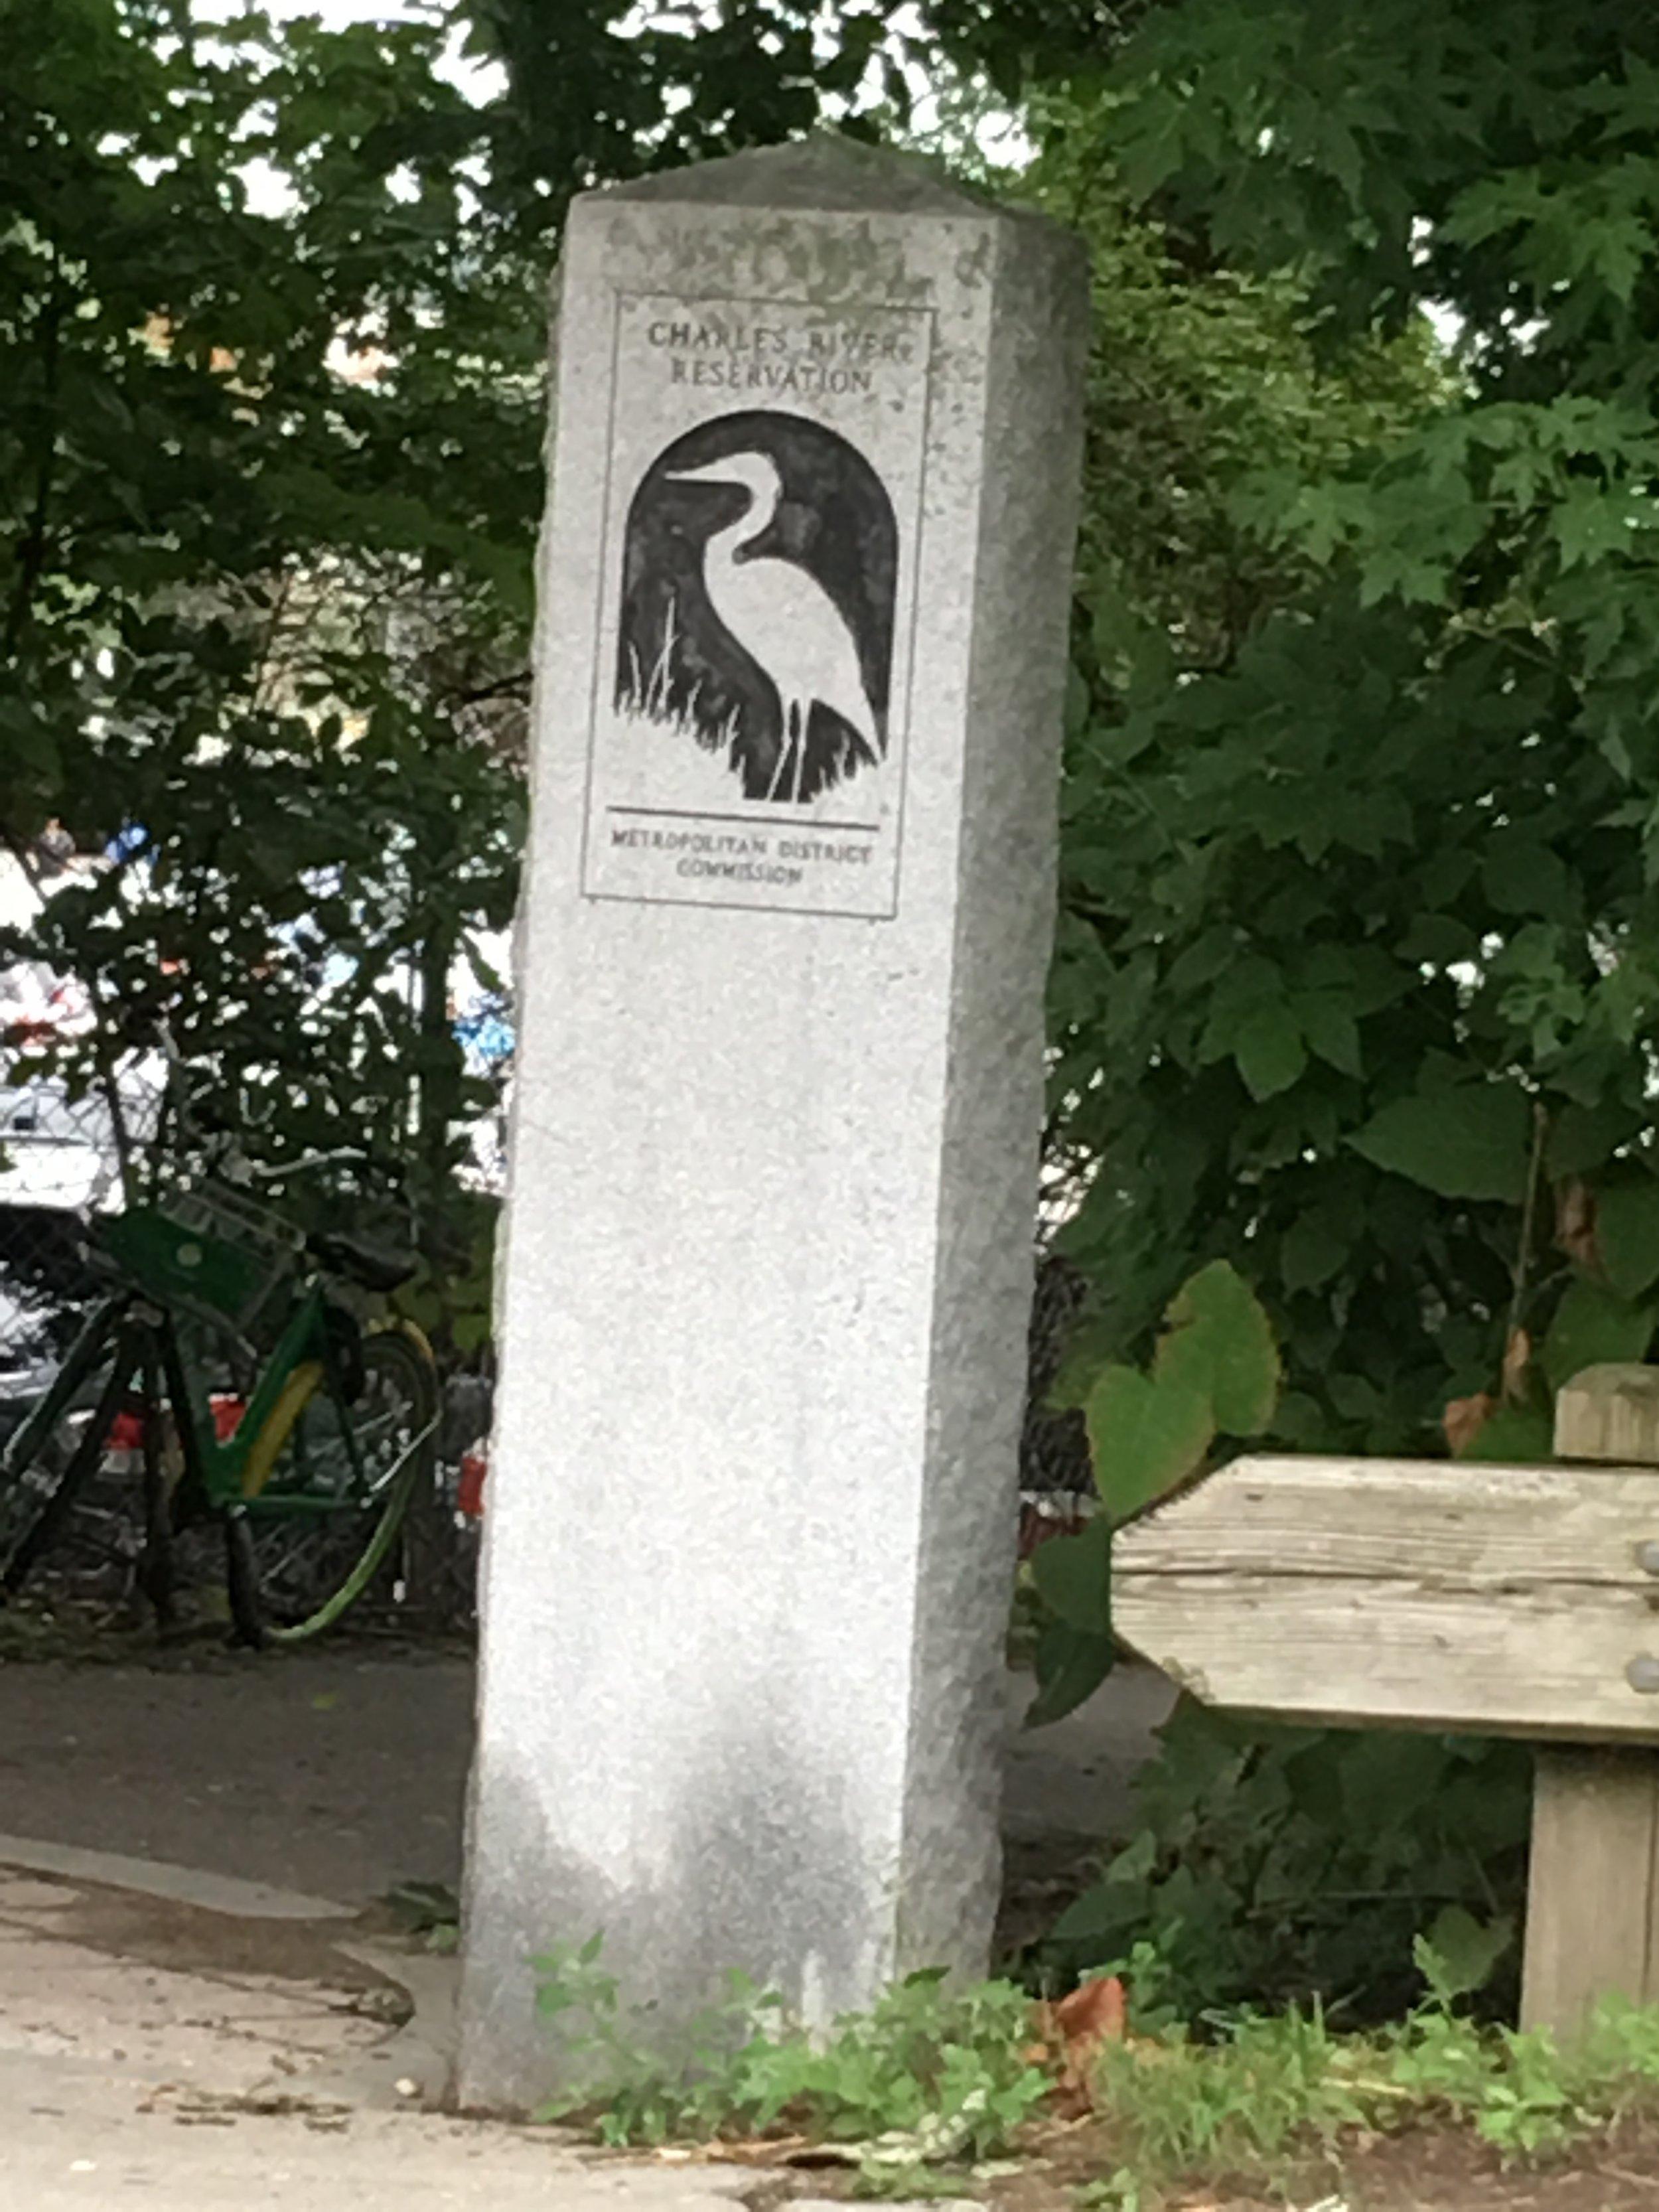 Marker along the bike trail